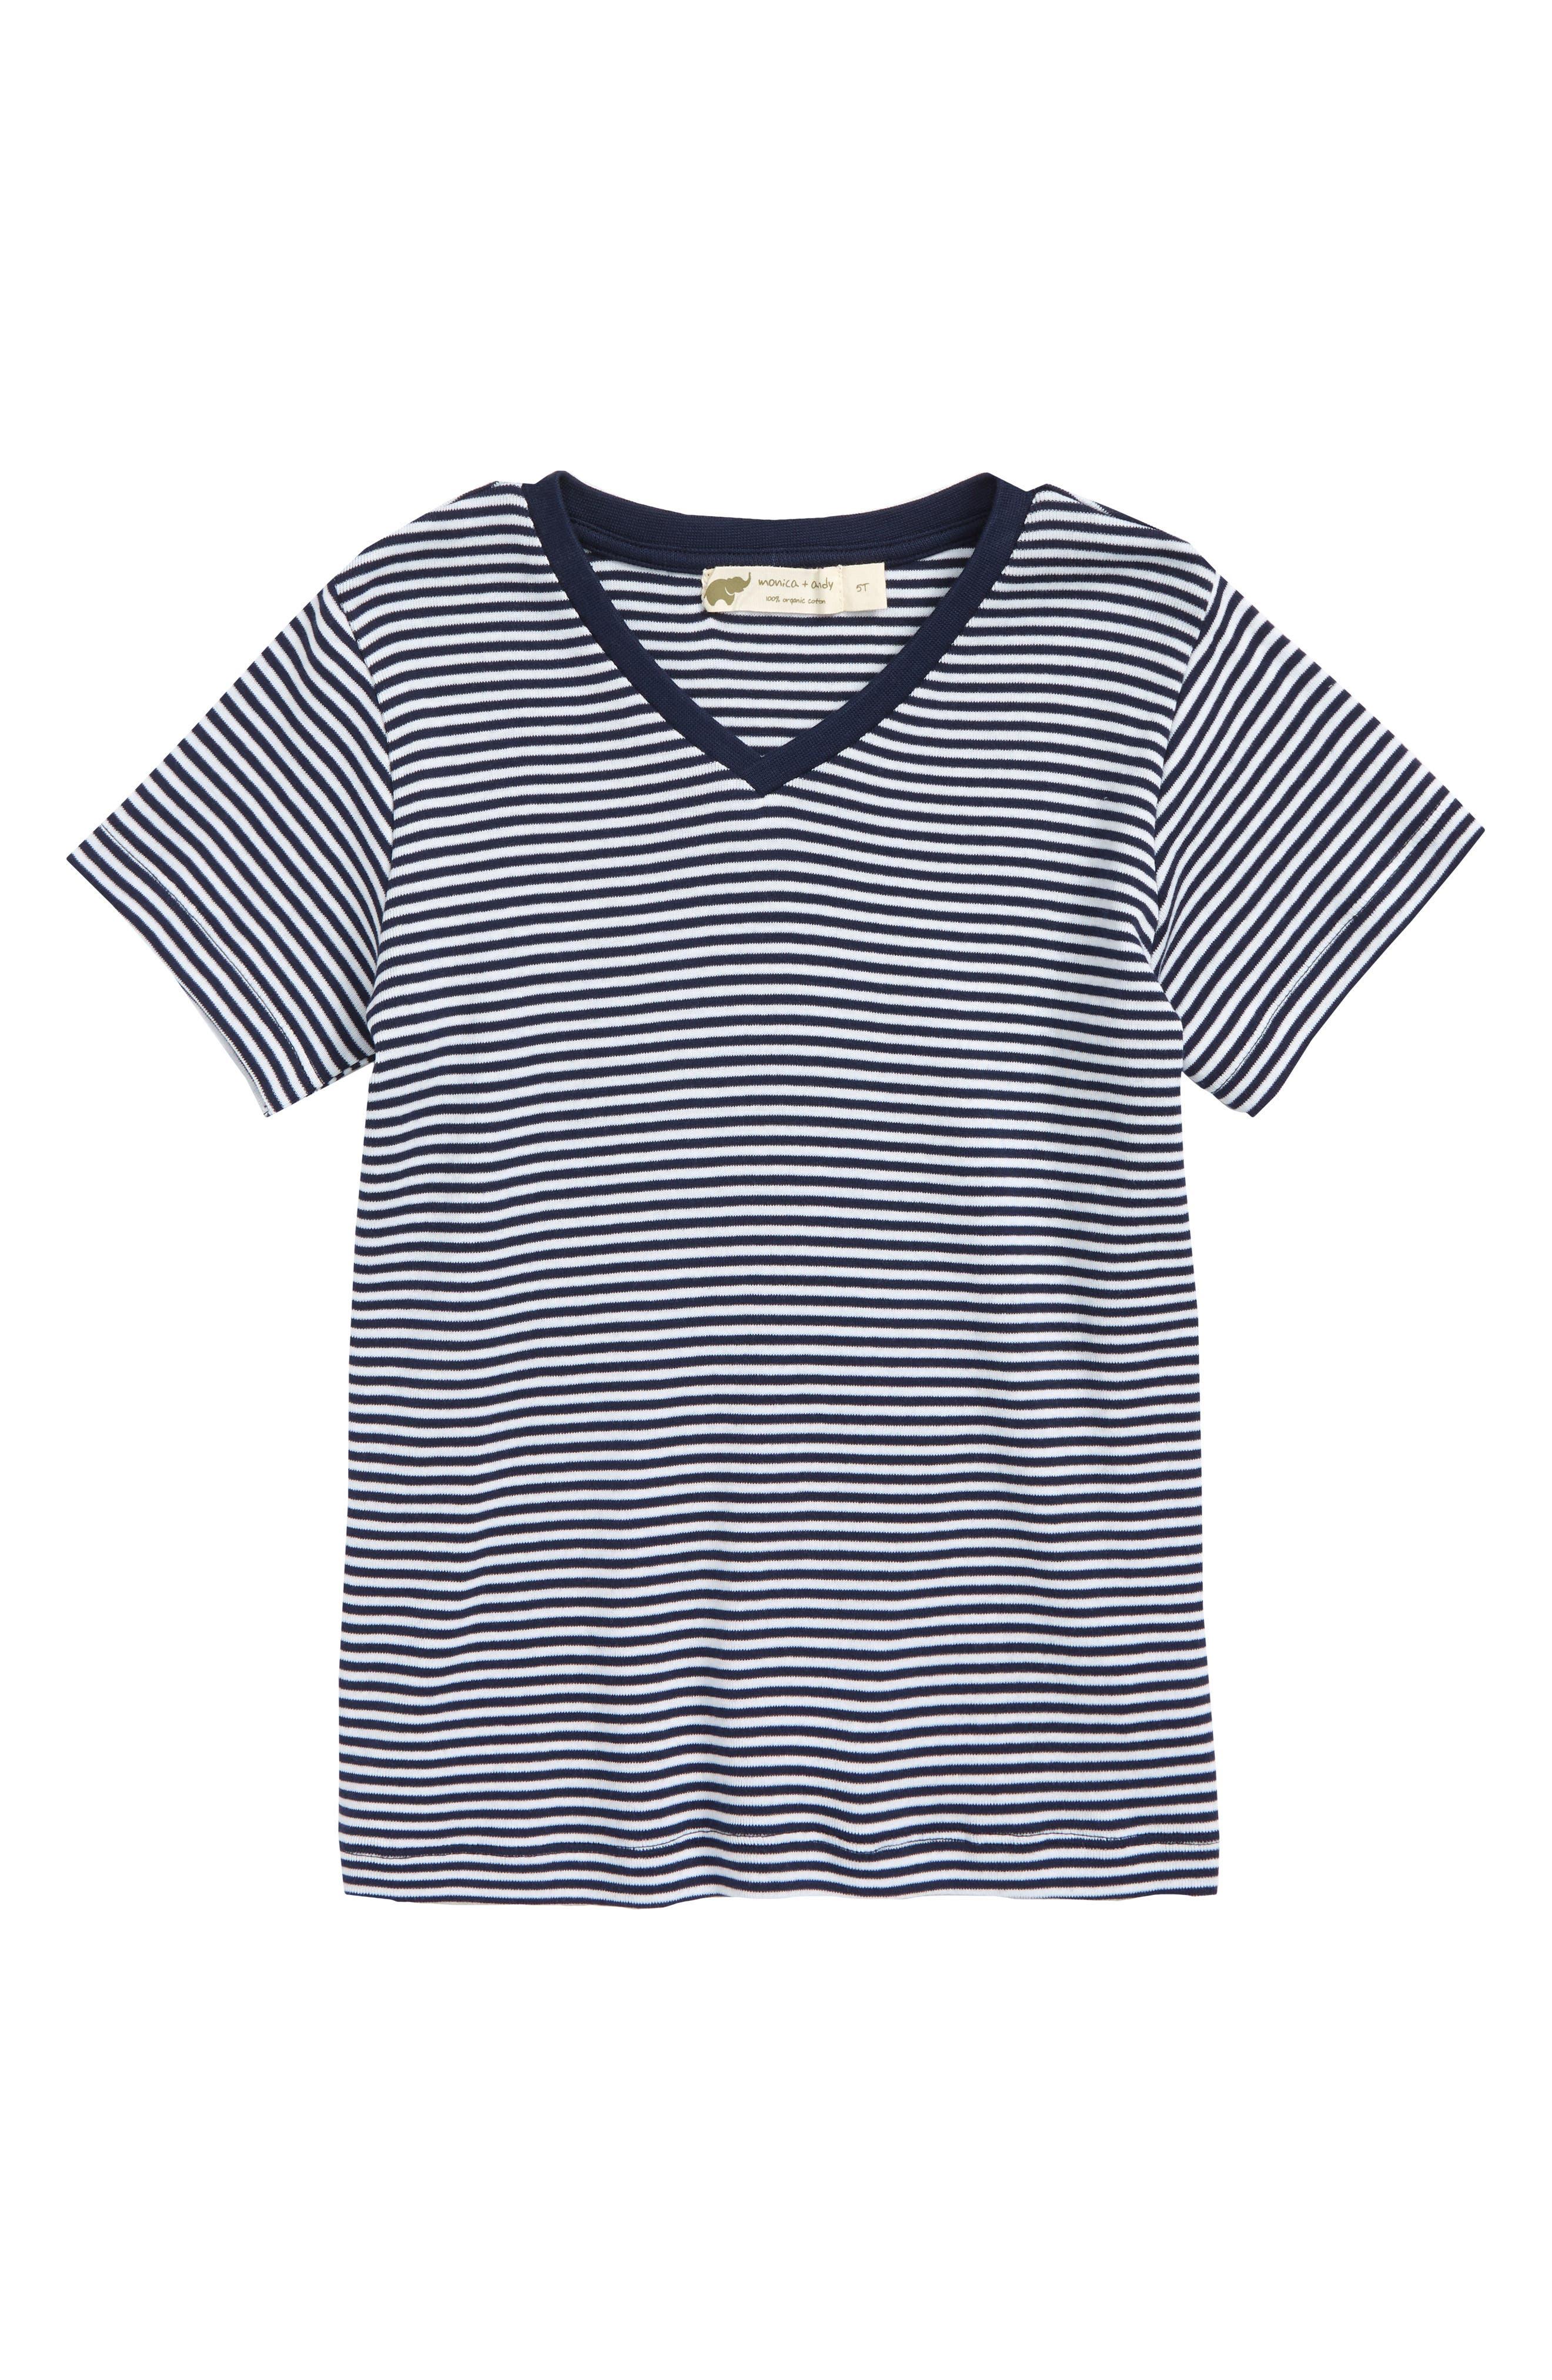 Stripe Organic Cotton T-Shirt,                             Main thumbnail 1, color,                             410